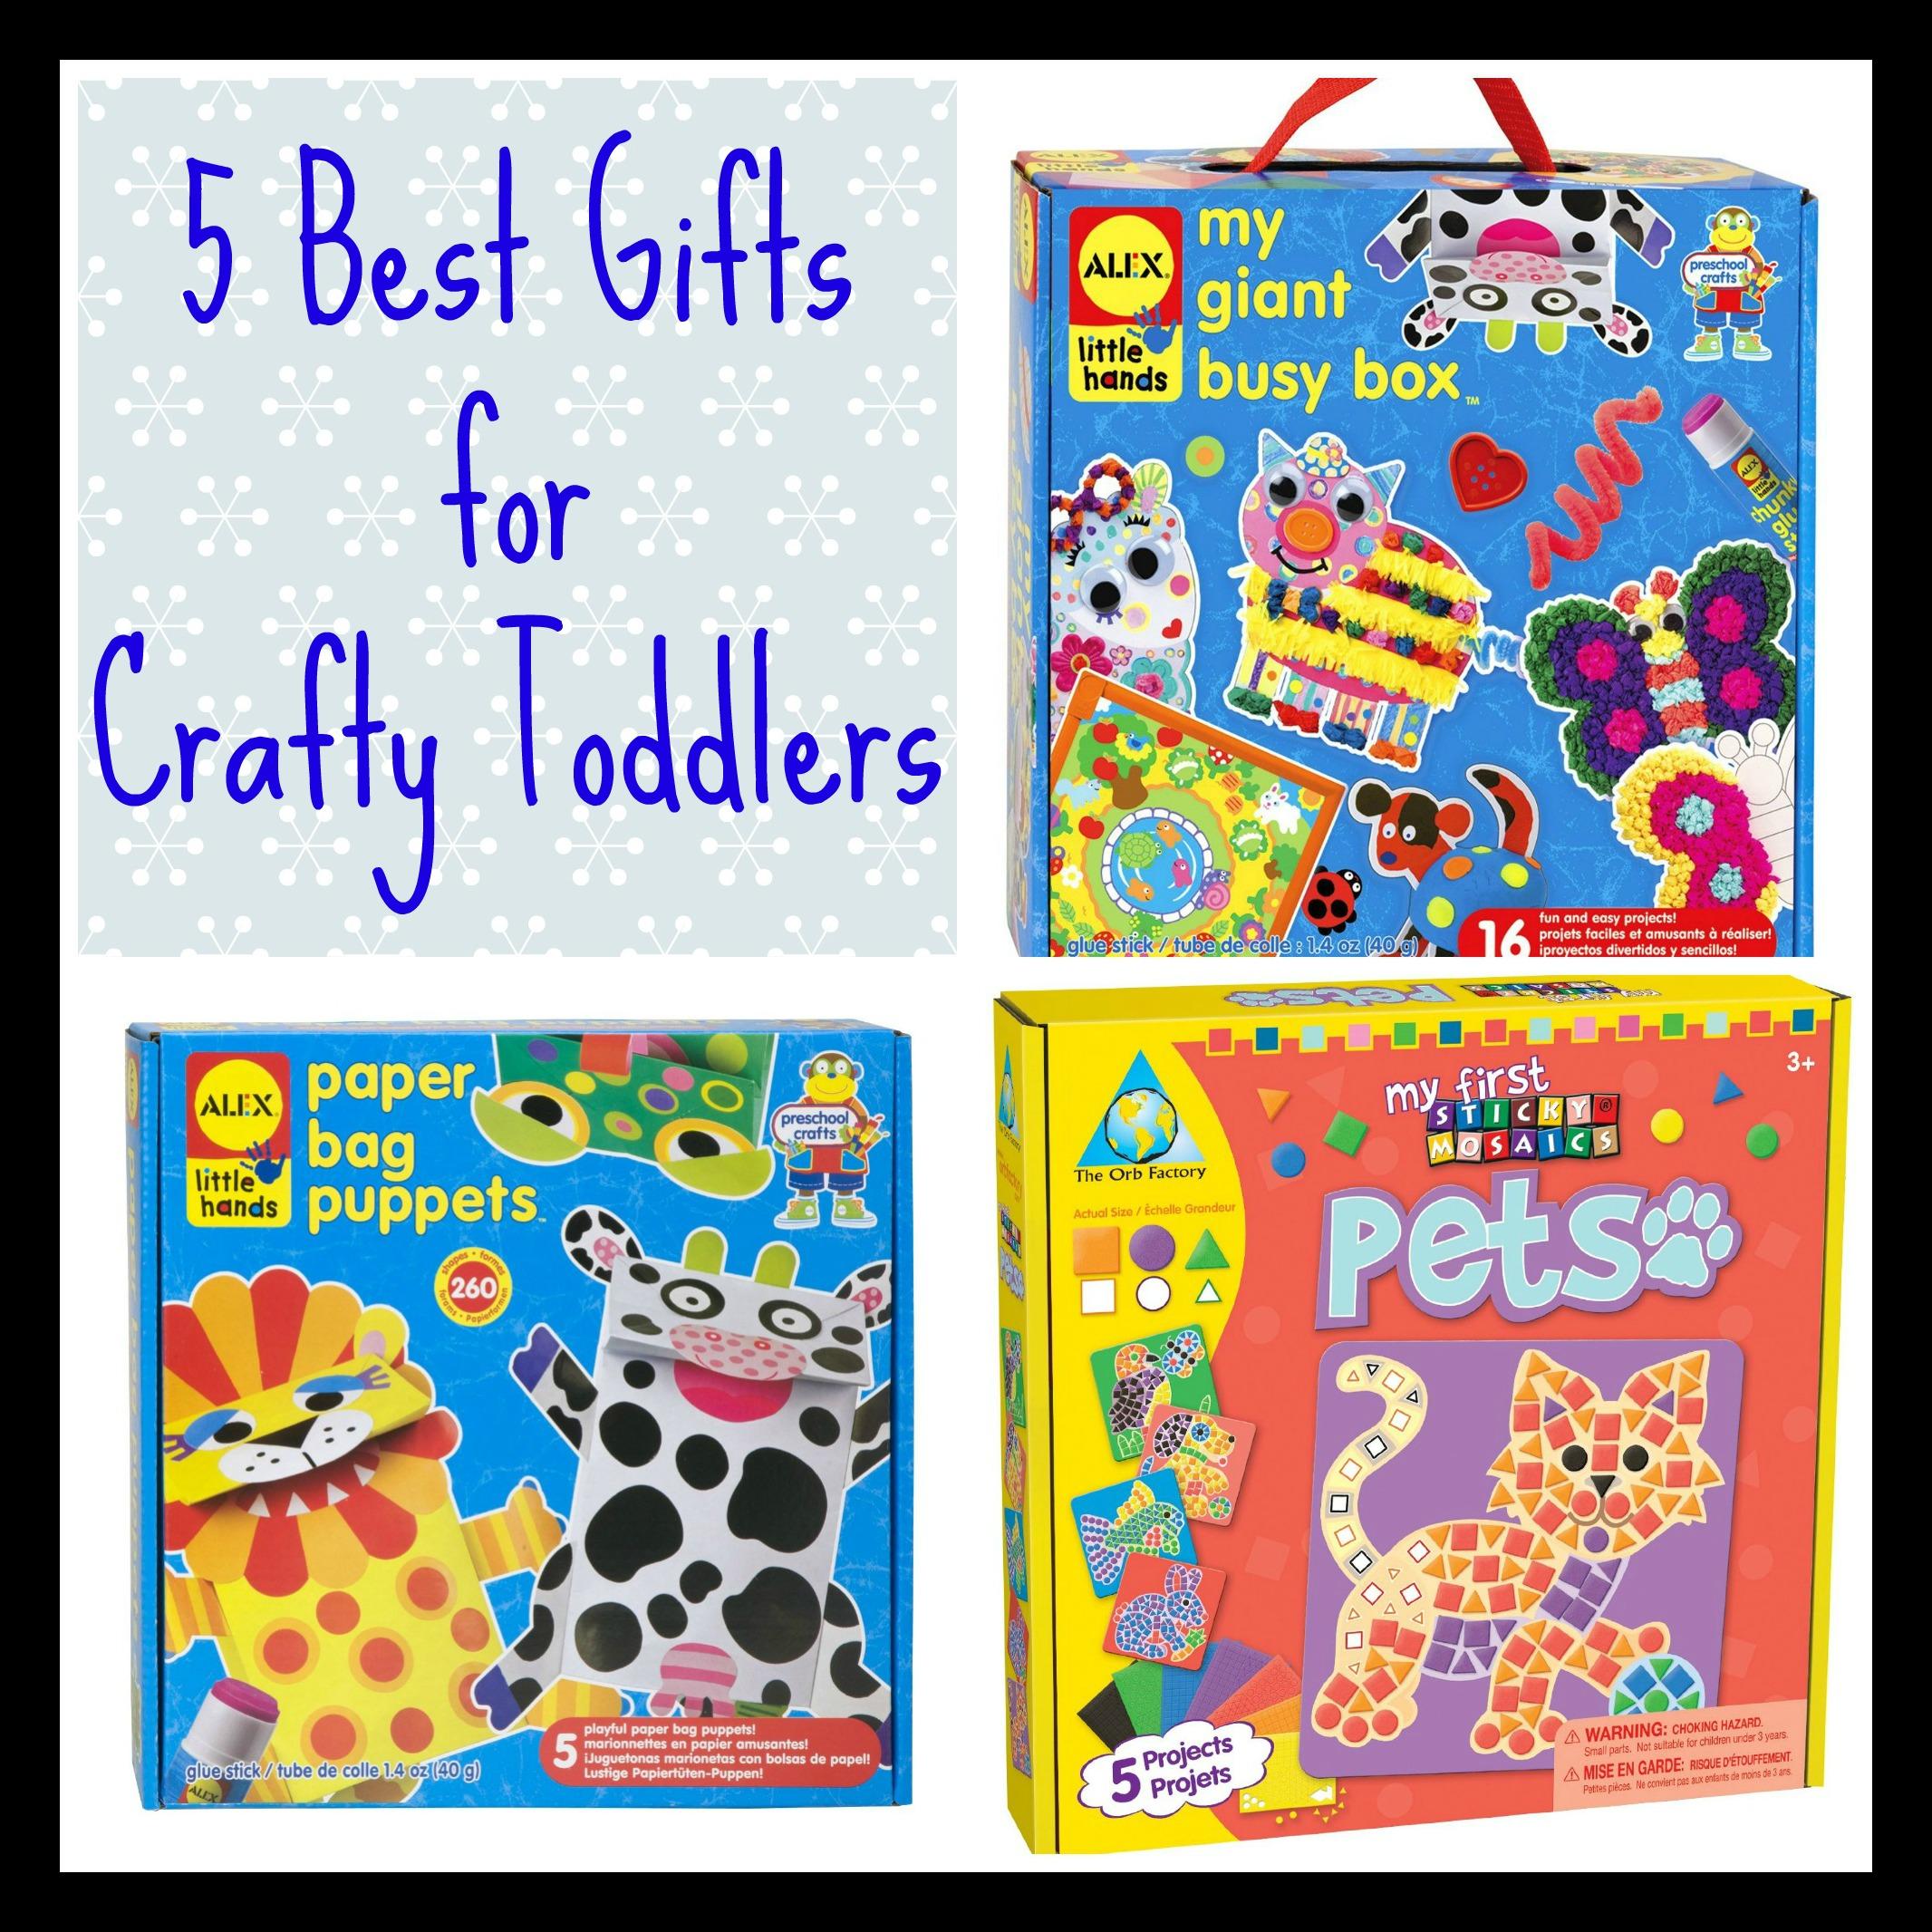 Craft kits for 4 year olds - Craft Kits For 3 Year Olds Best Craft Kits For 6 Year Olds Best Kids